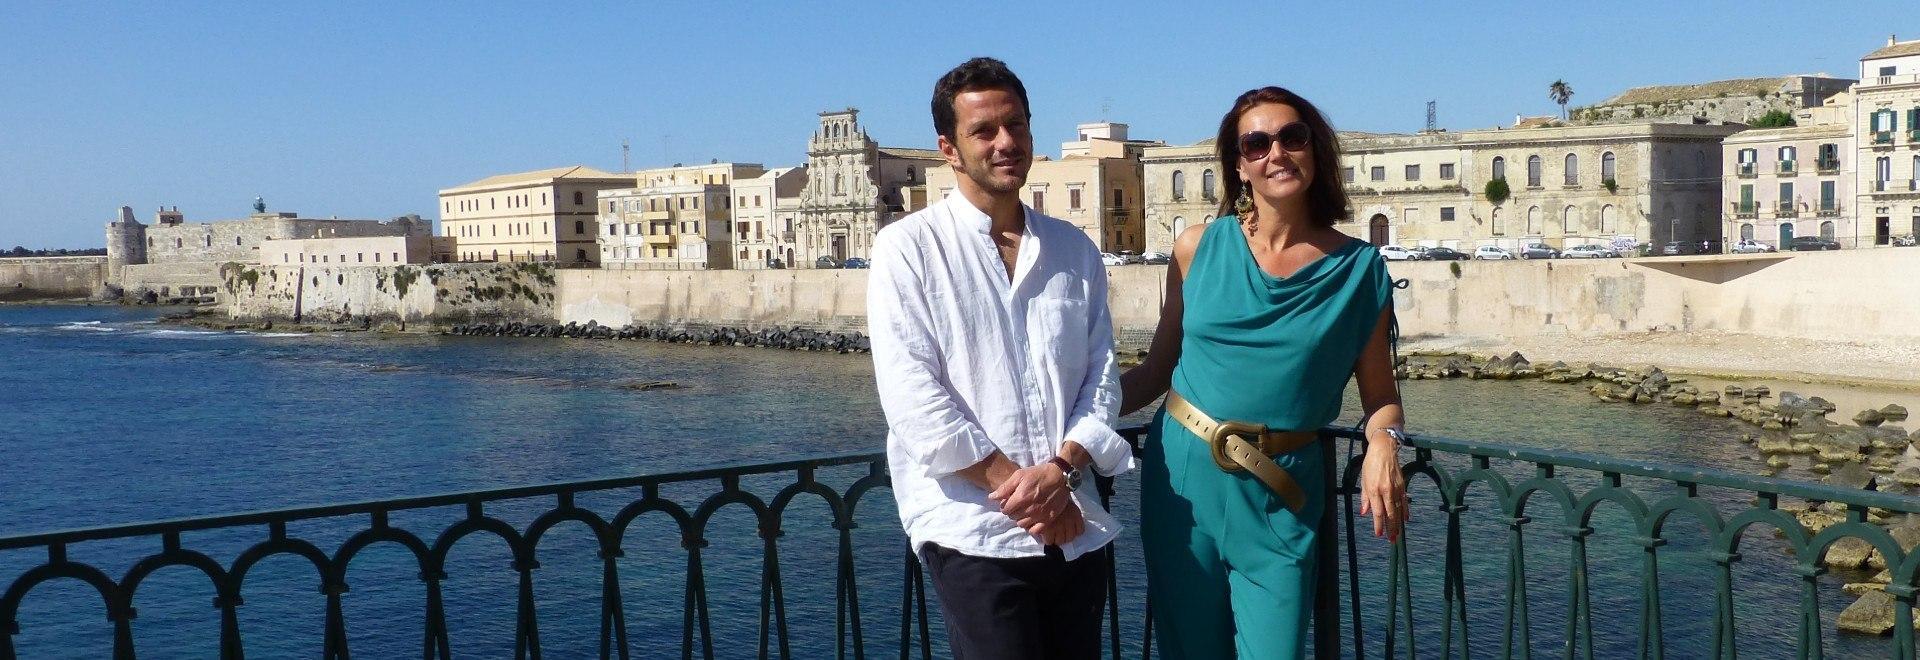 Liguria: Golfo del Tigullio